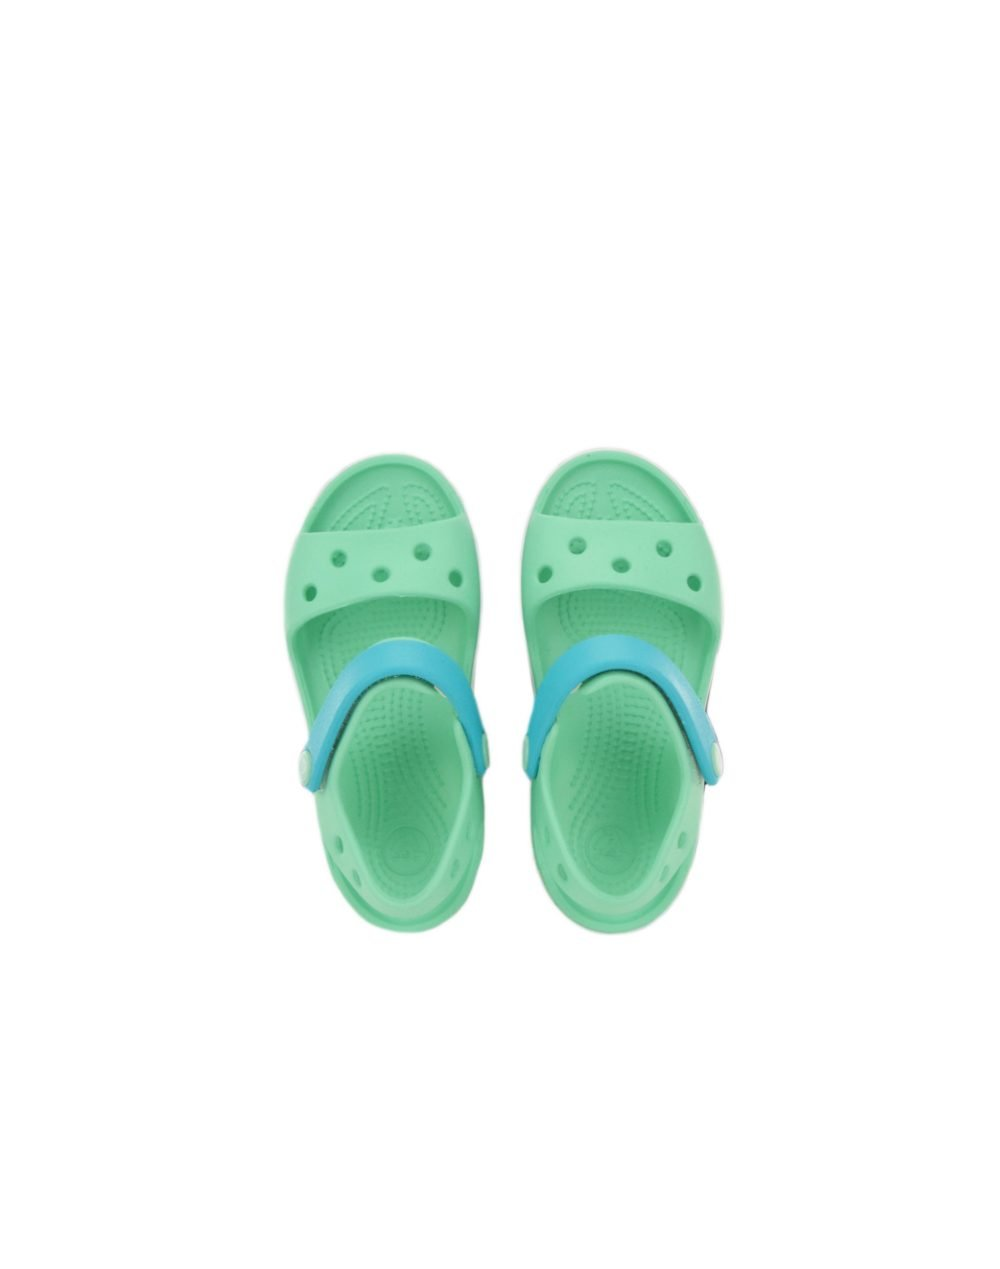 Crocs Crocband Sandal Kids (12856-3U3) Pistachio